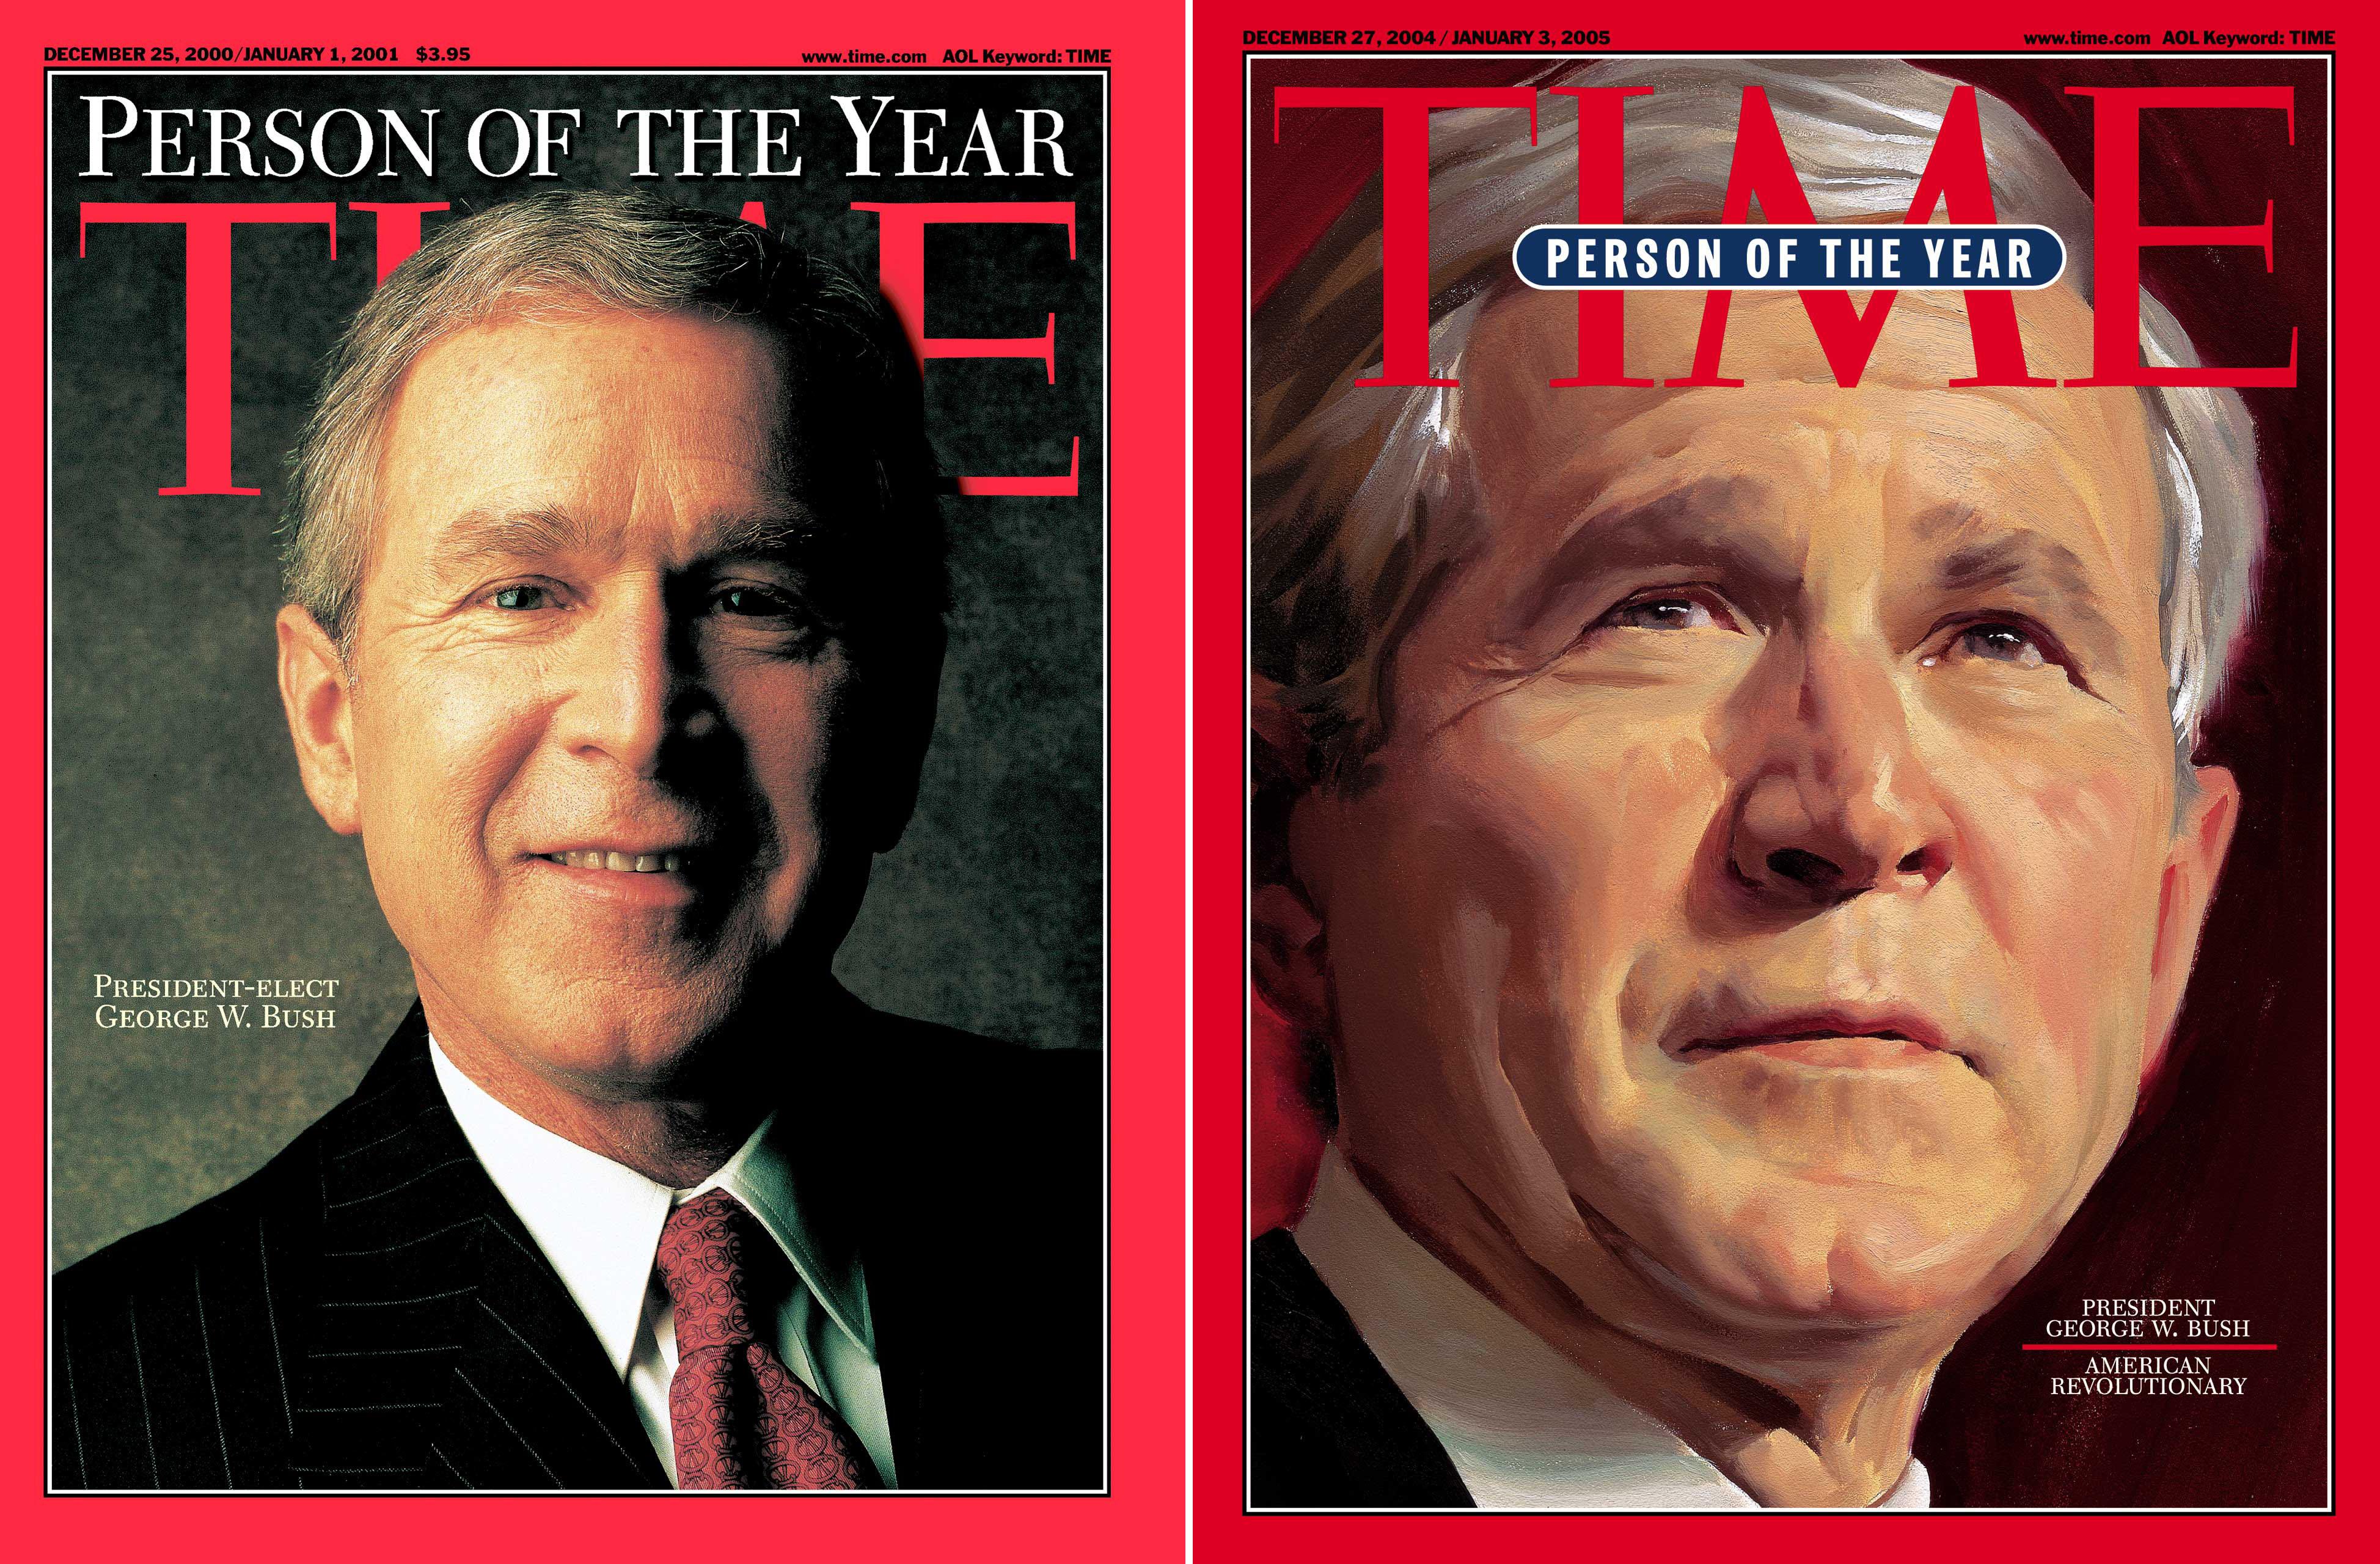 Bush POY Covers